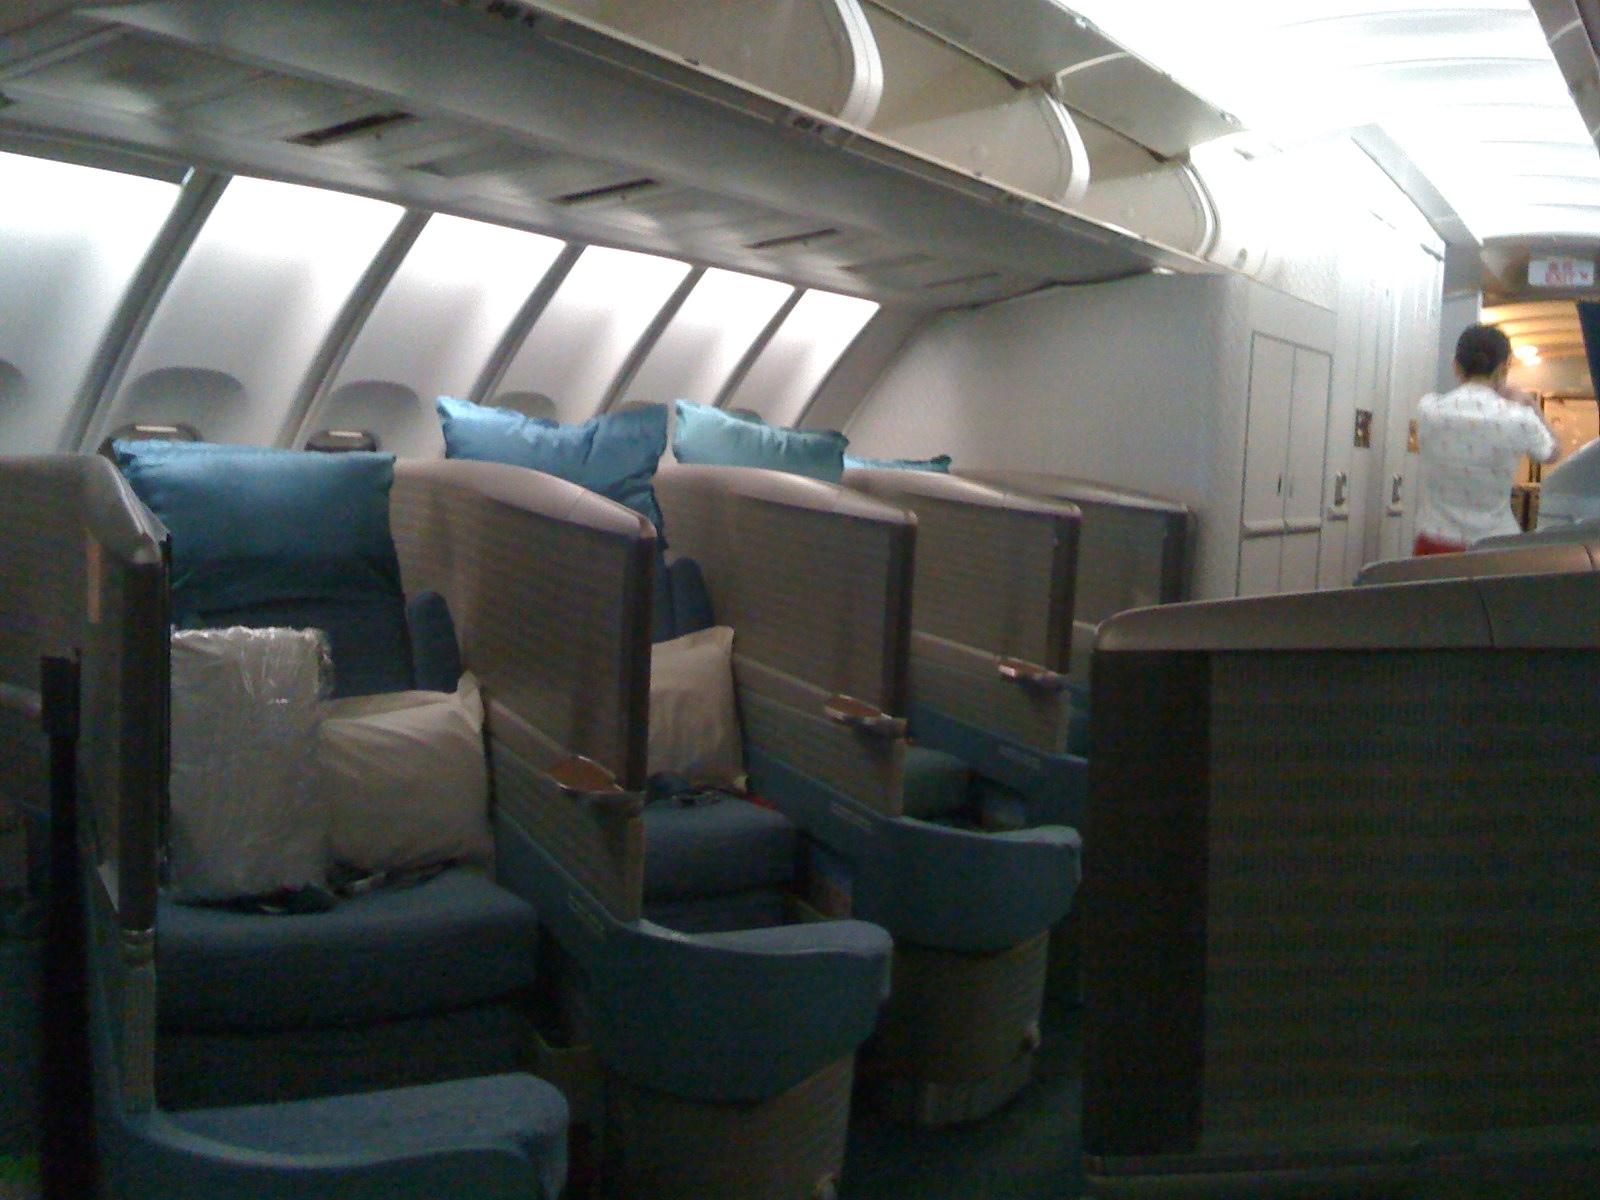 File Cx Business Class Seats 747 Upper Jpg Wikimedia Commons